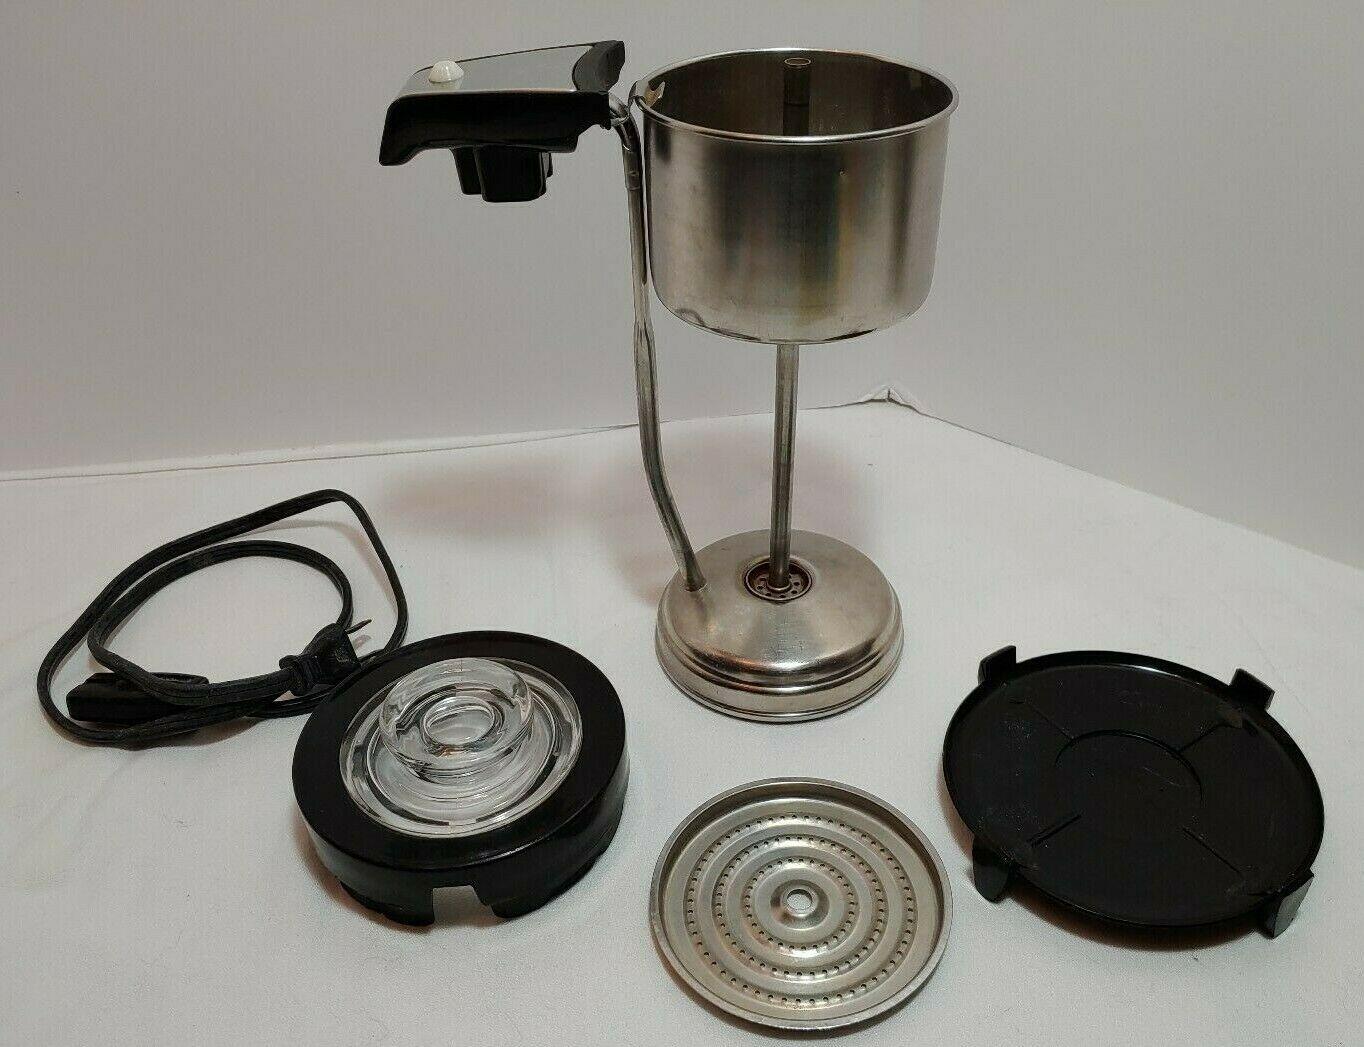 Corning Ware Electric 10 Cup Percolator / Coffee Pot